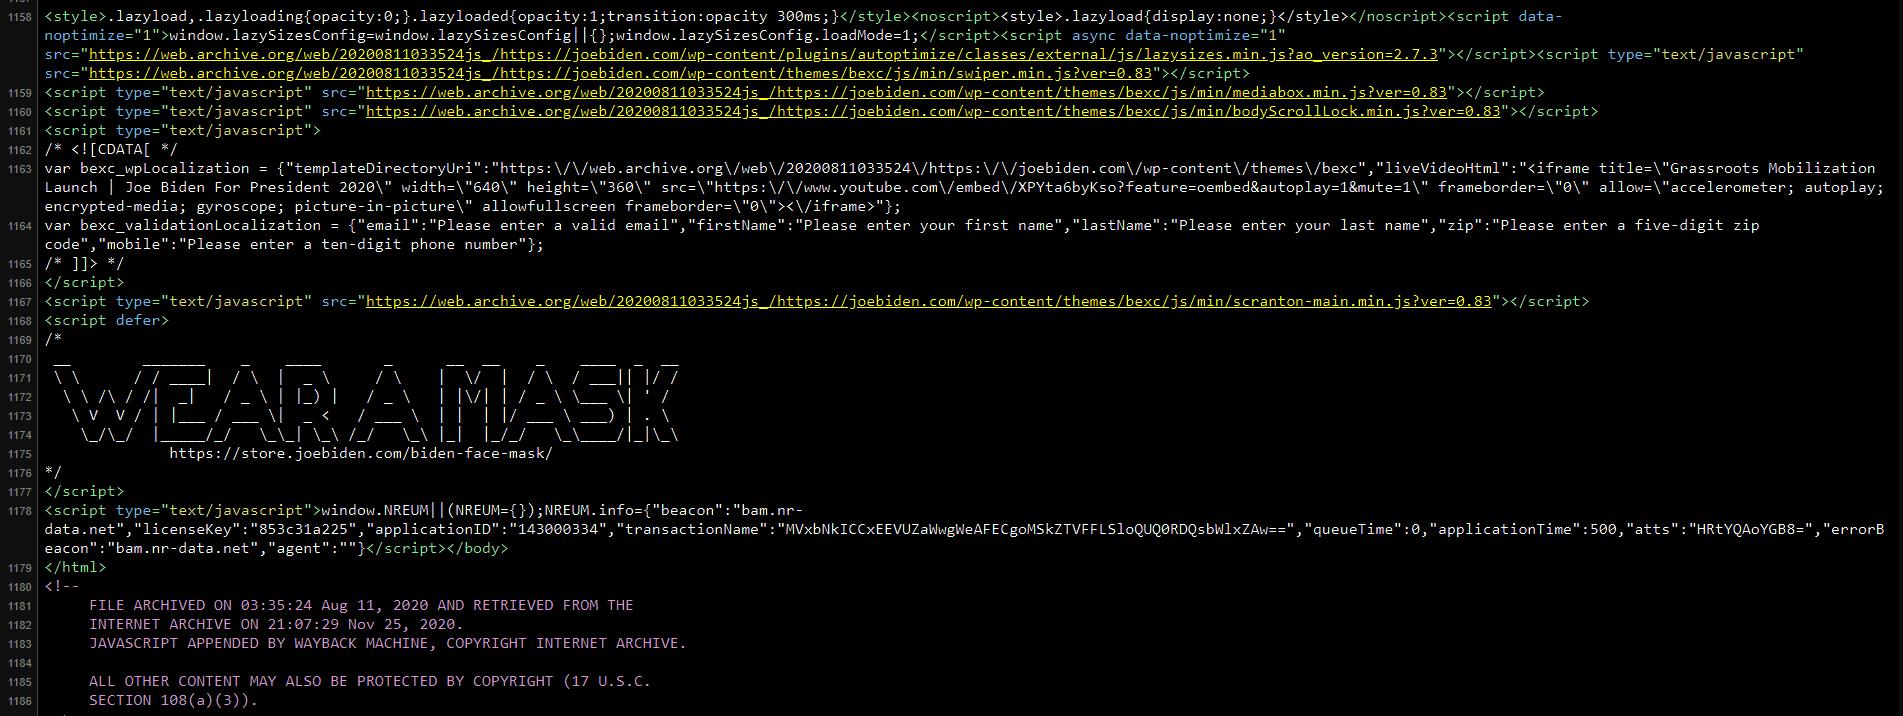 Joebiden.com has a message masked in the source code